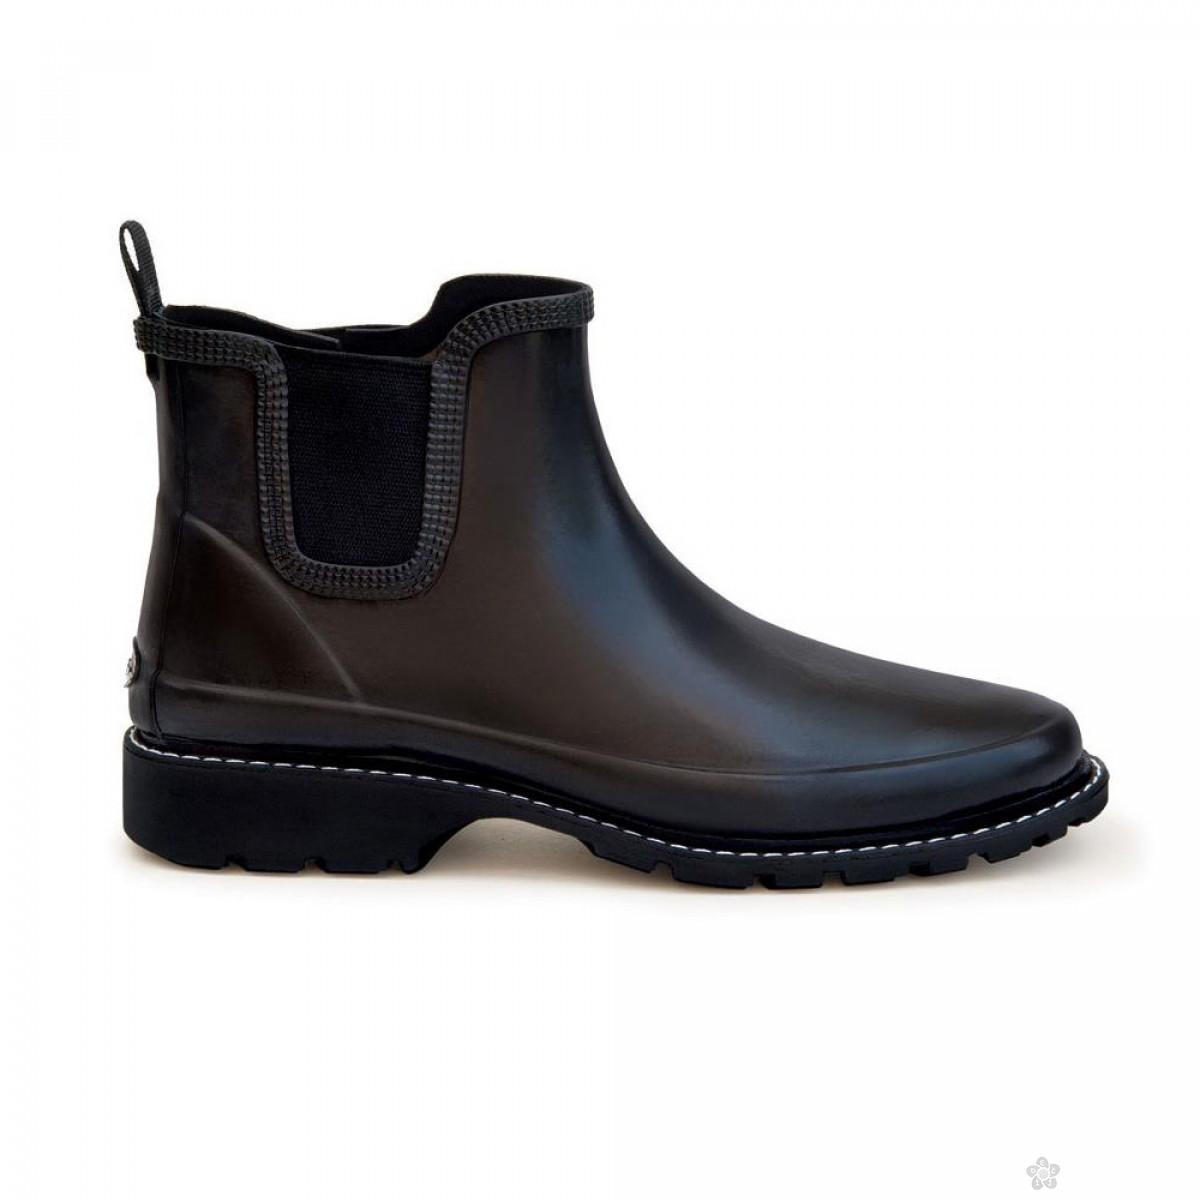 Tigar gumene cipele, crne